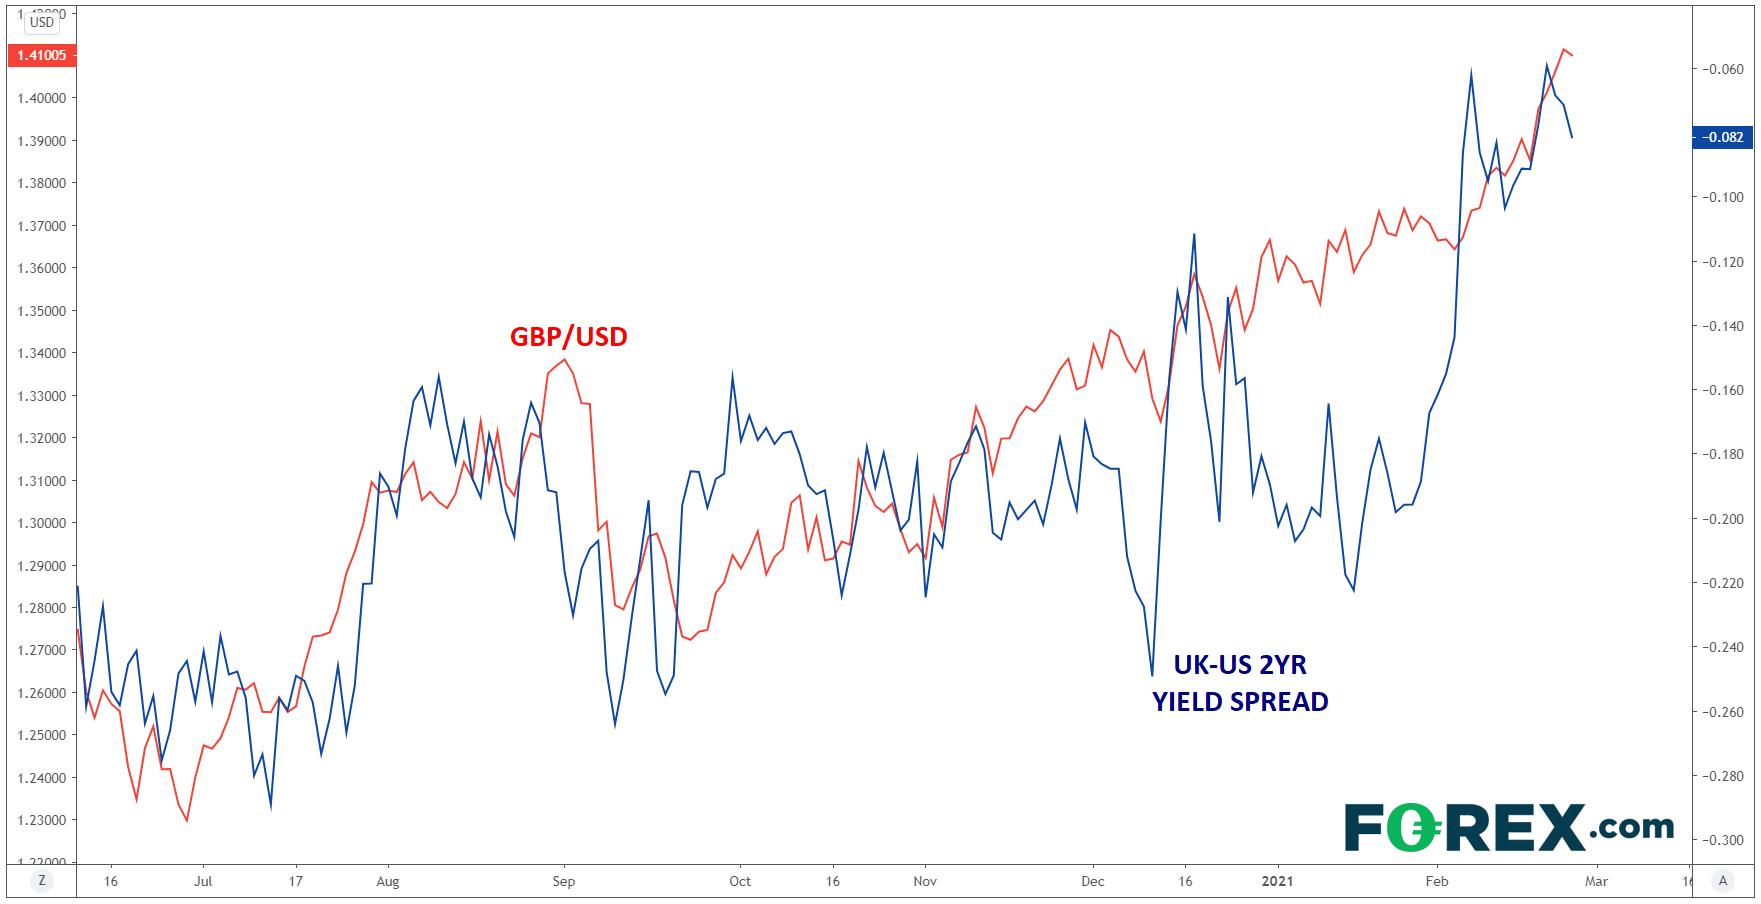 GBP/USD vs US:UK 2Y Bond Spread